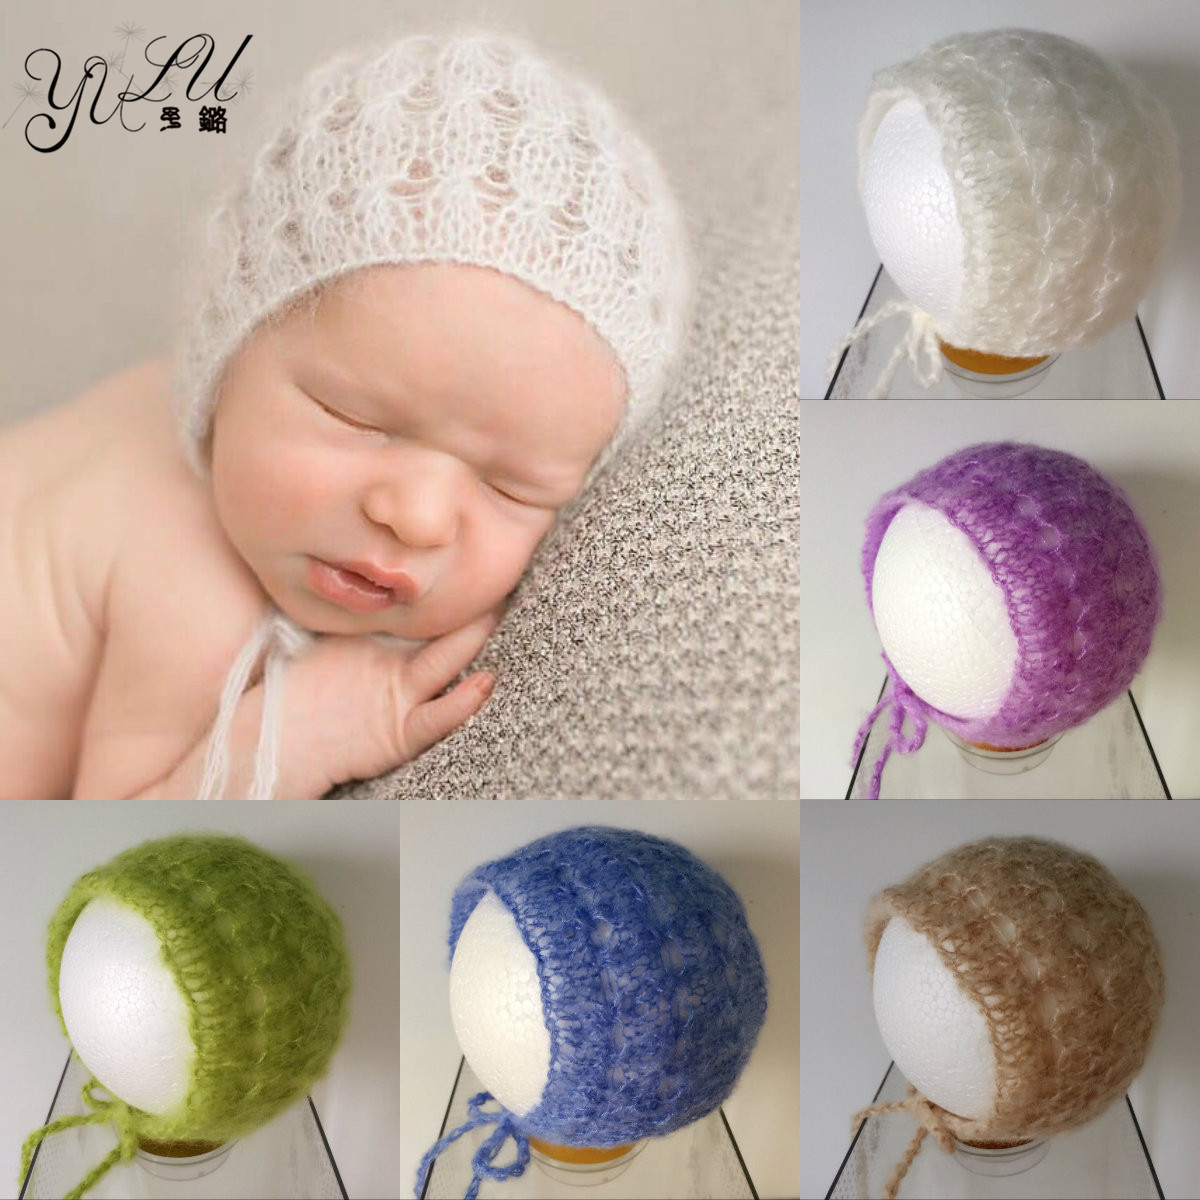 Newborn Mohair Bonnet 0-6 Month Newborn Hat Beanie Baby Crochet Knit Soft Baby Beige Grey White Cap Newborn Photography Props